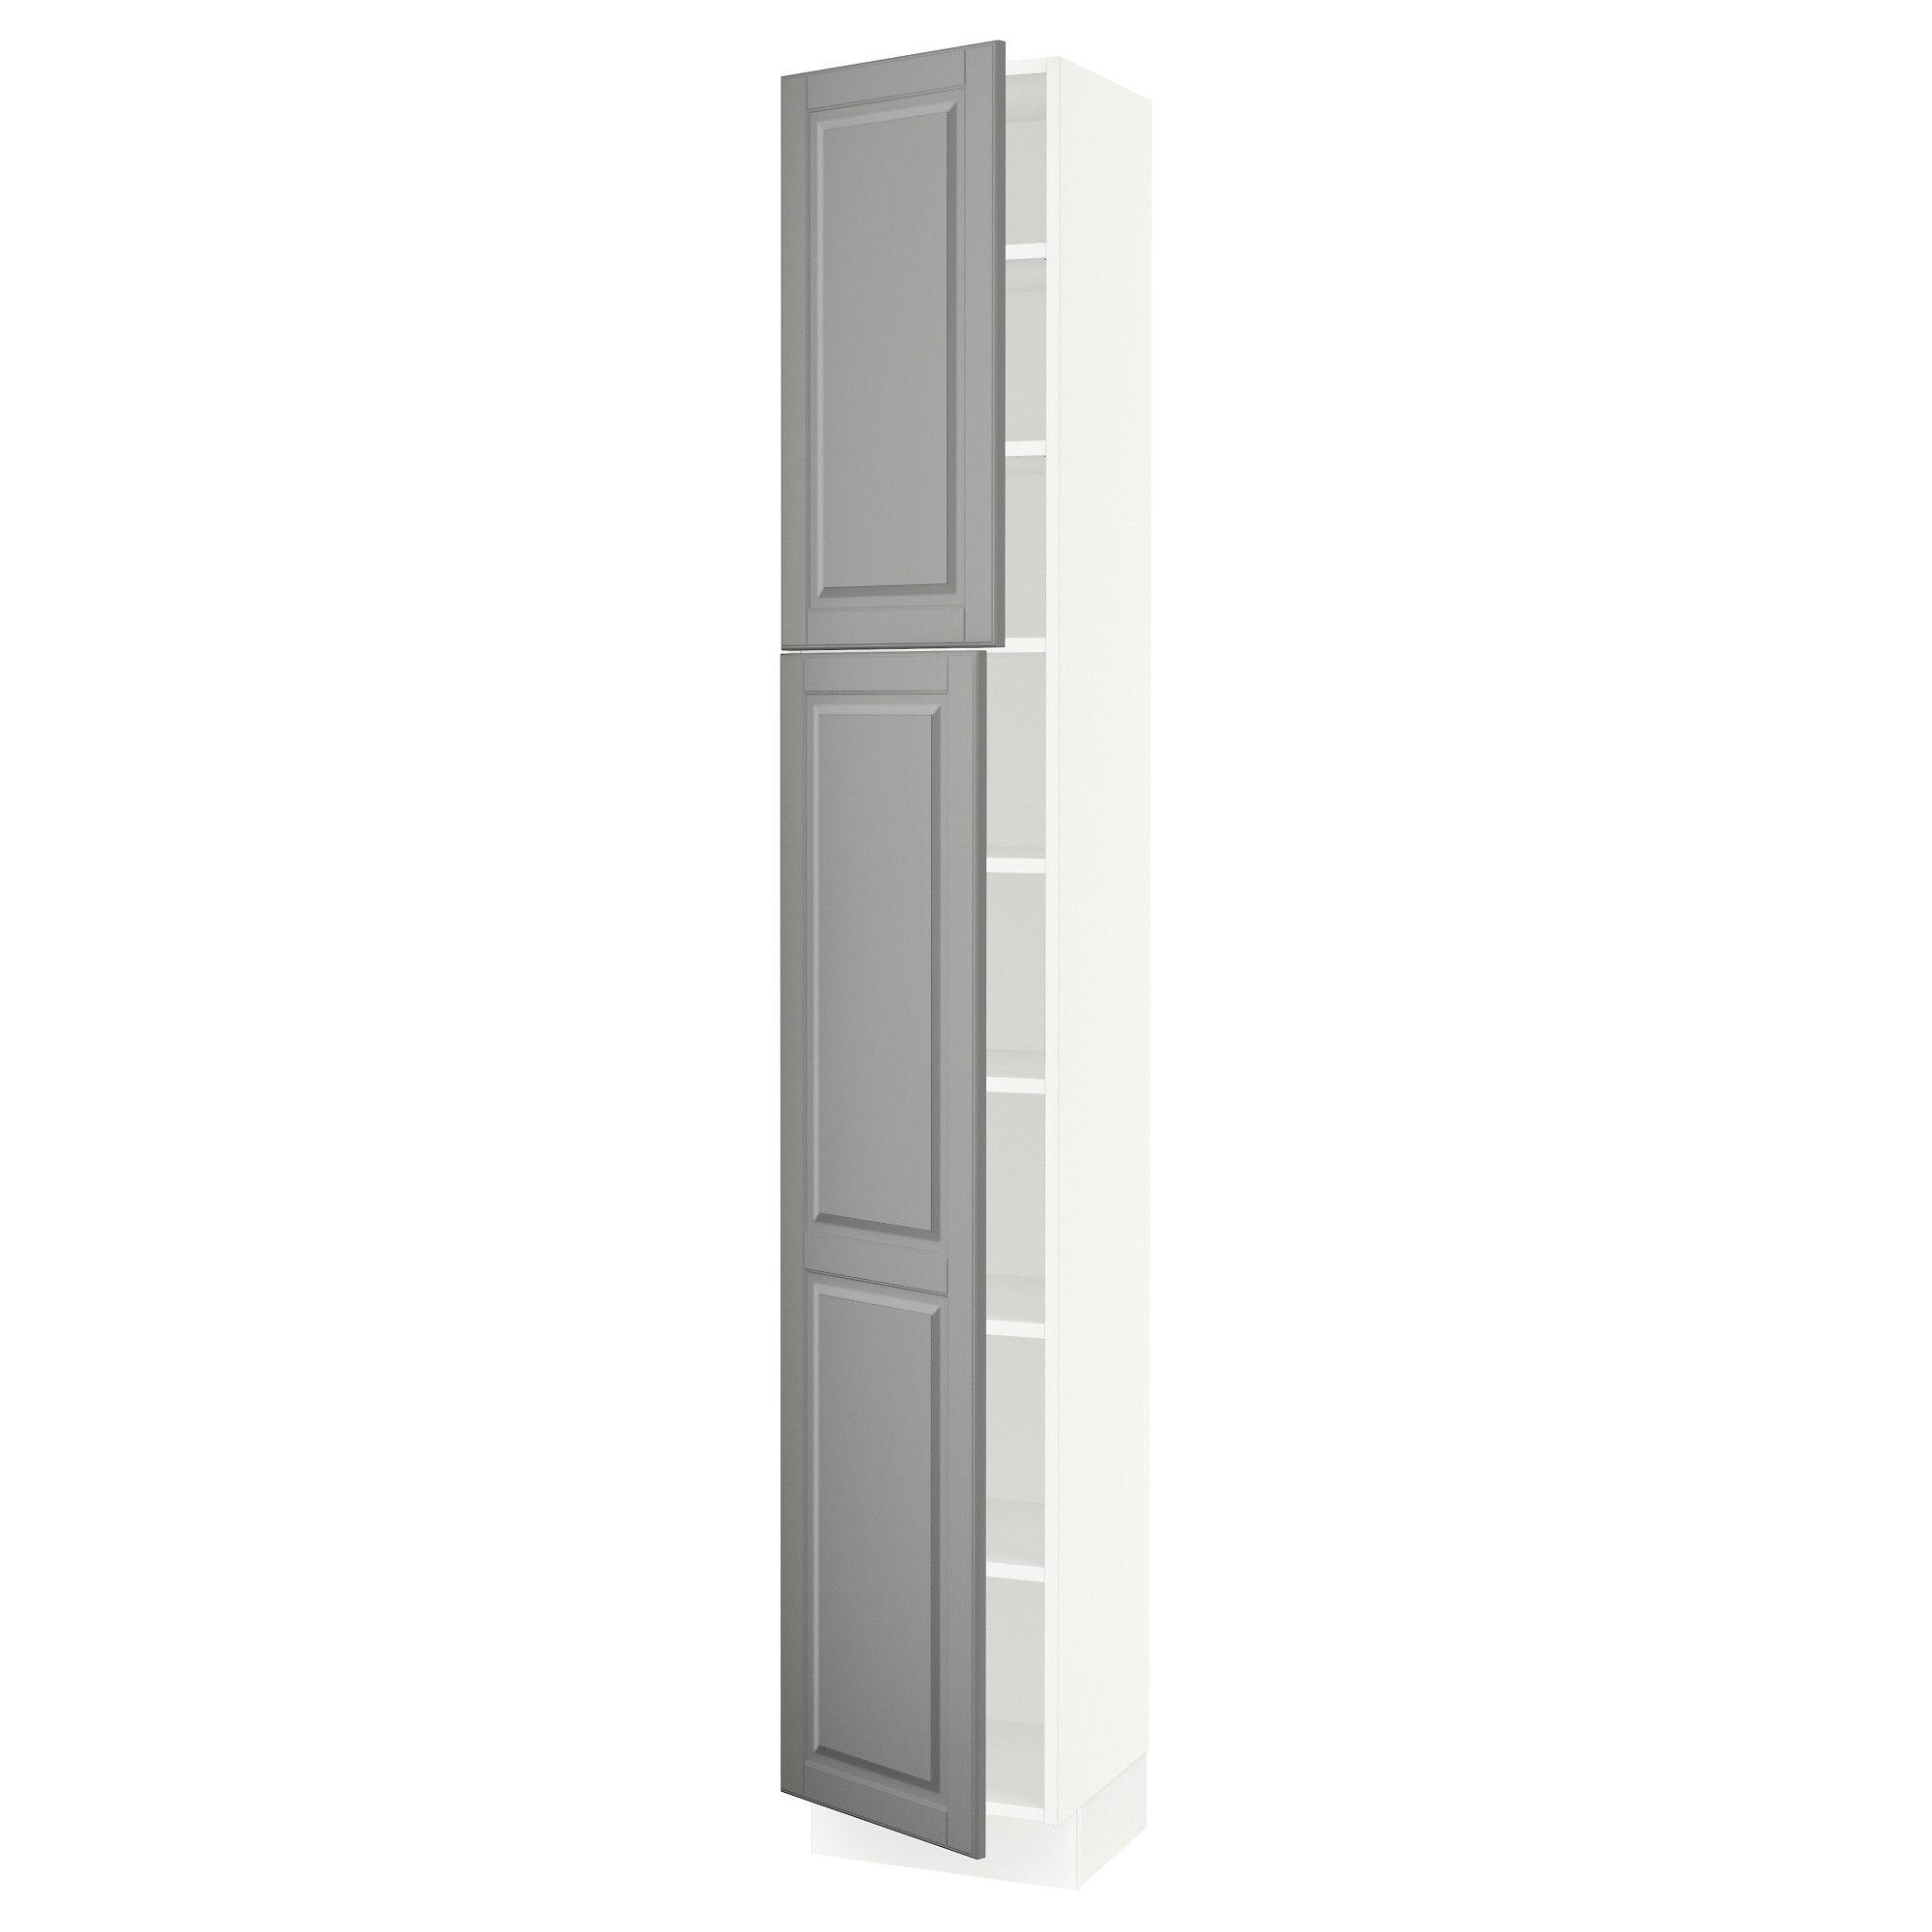 Furniture And Home Furnishings Ikea Bodbyn Grey Cabinet